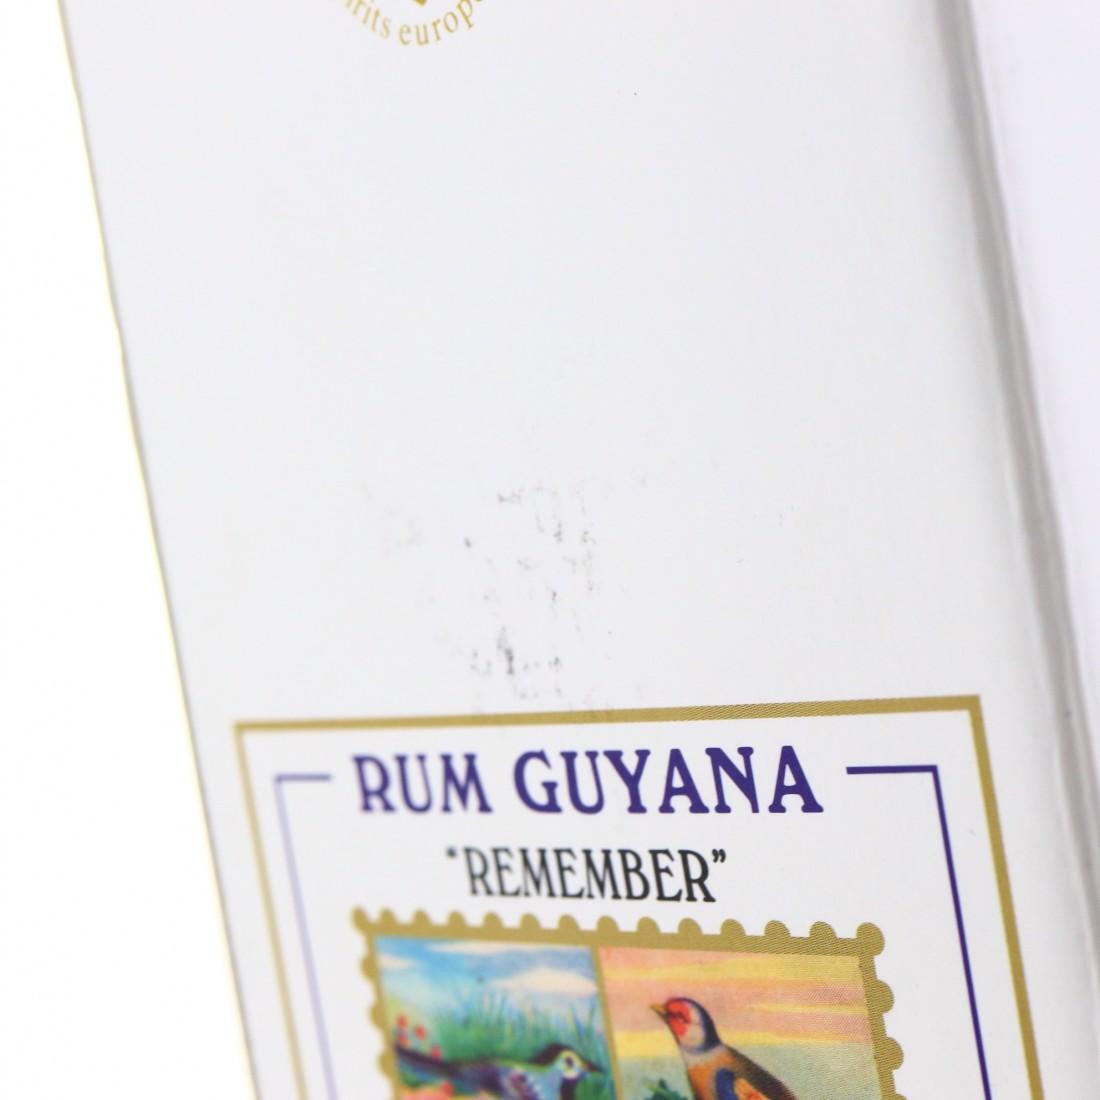 Guyana 'Remember' Moon Import Reserve